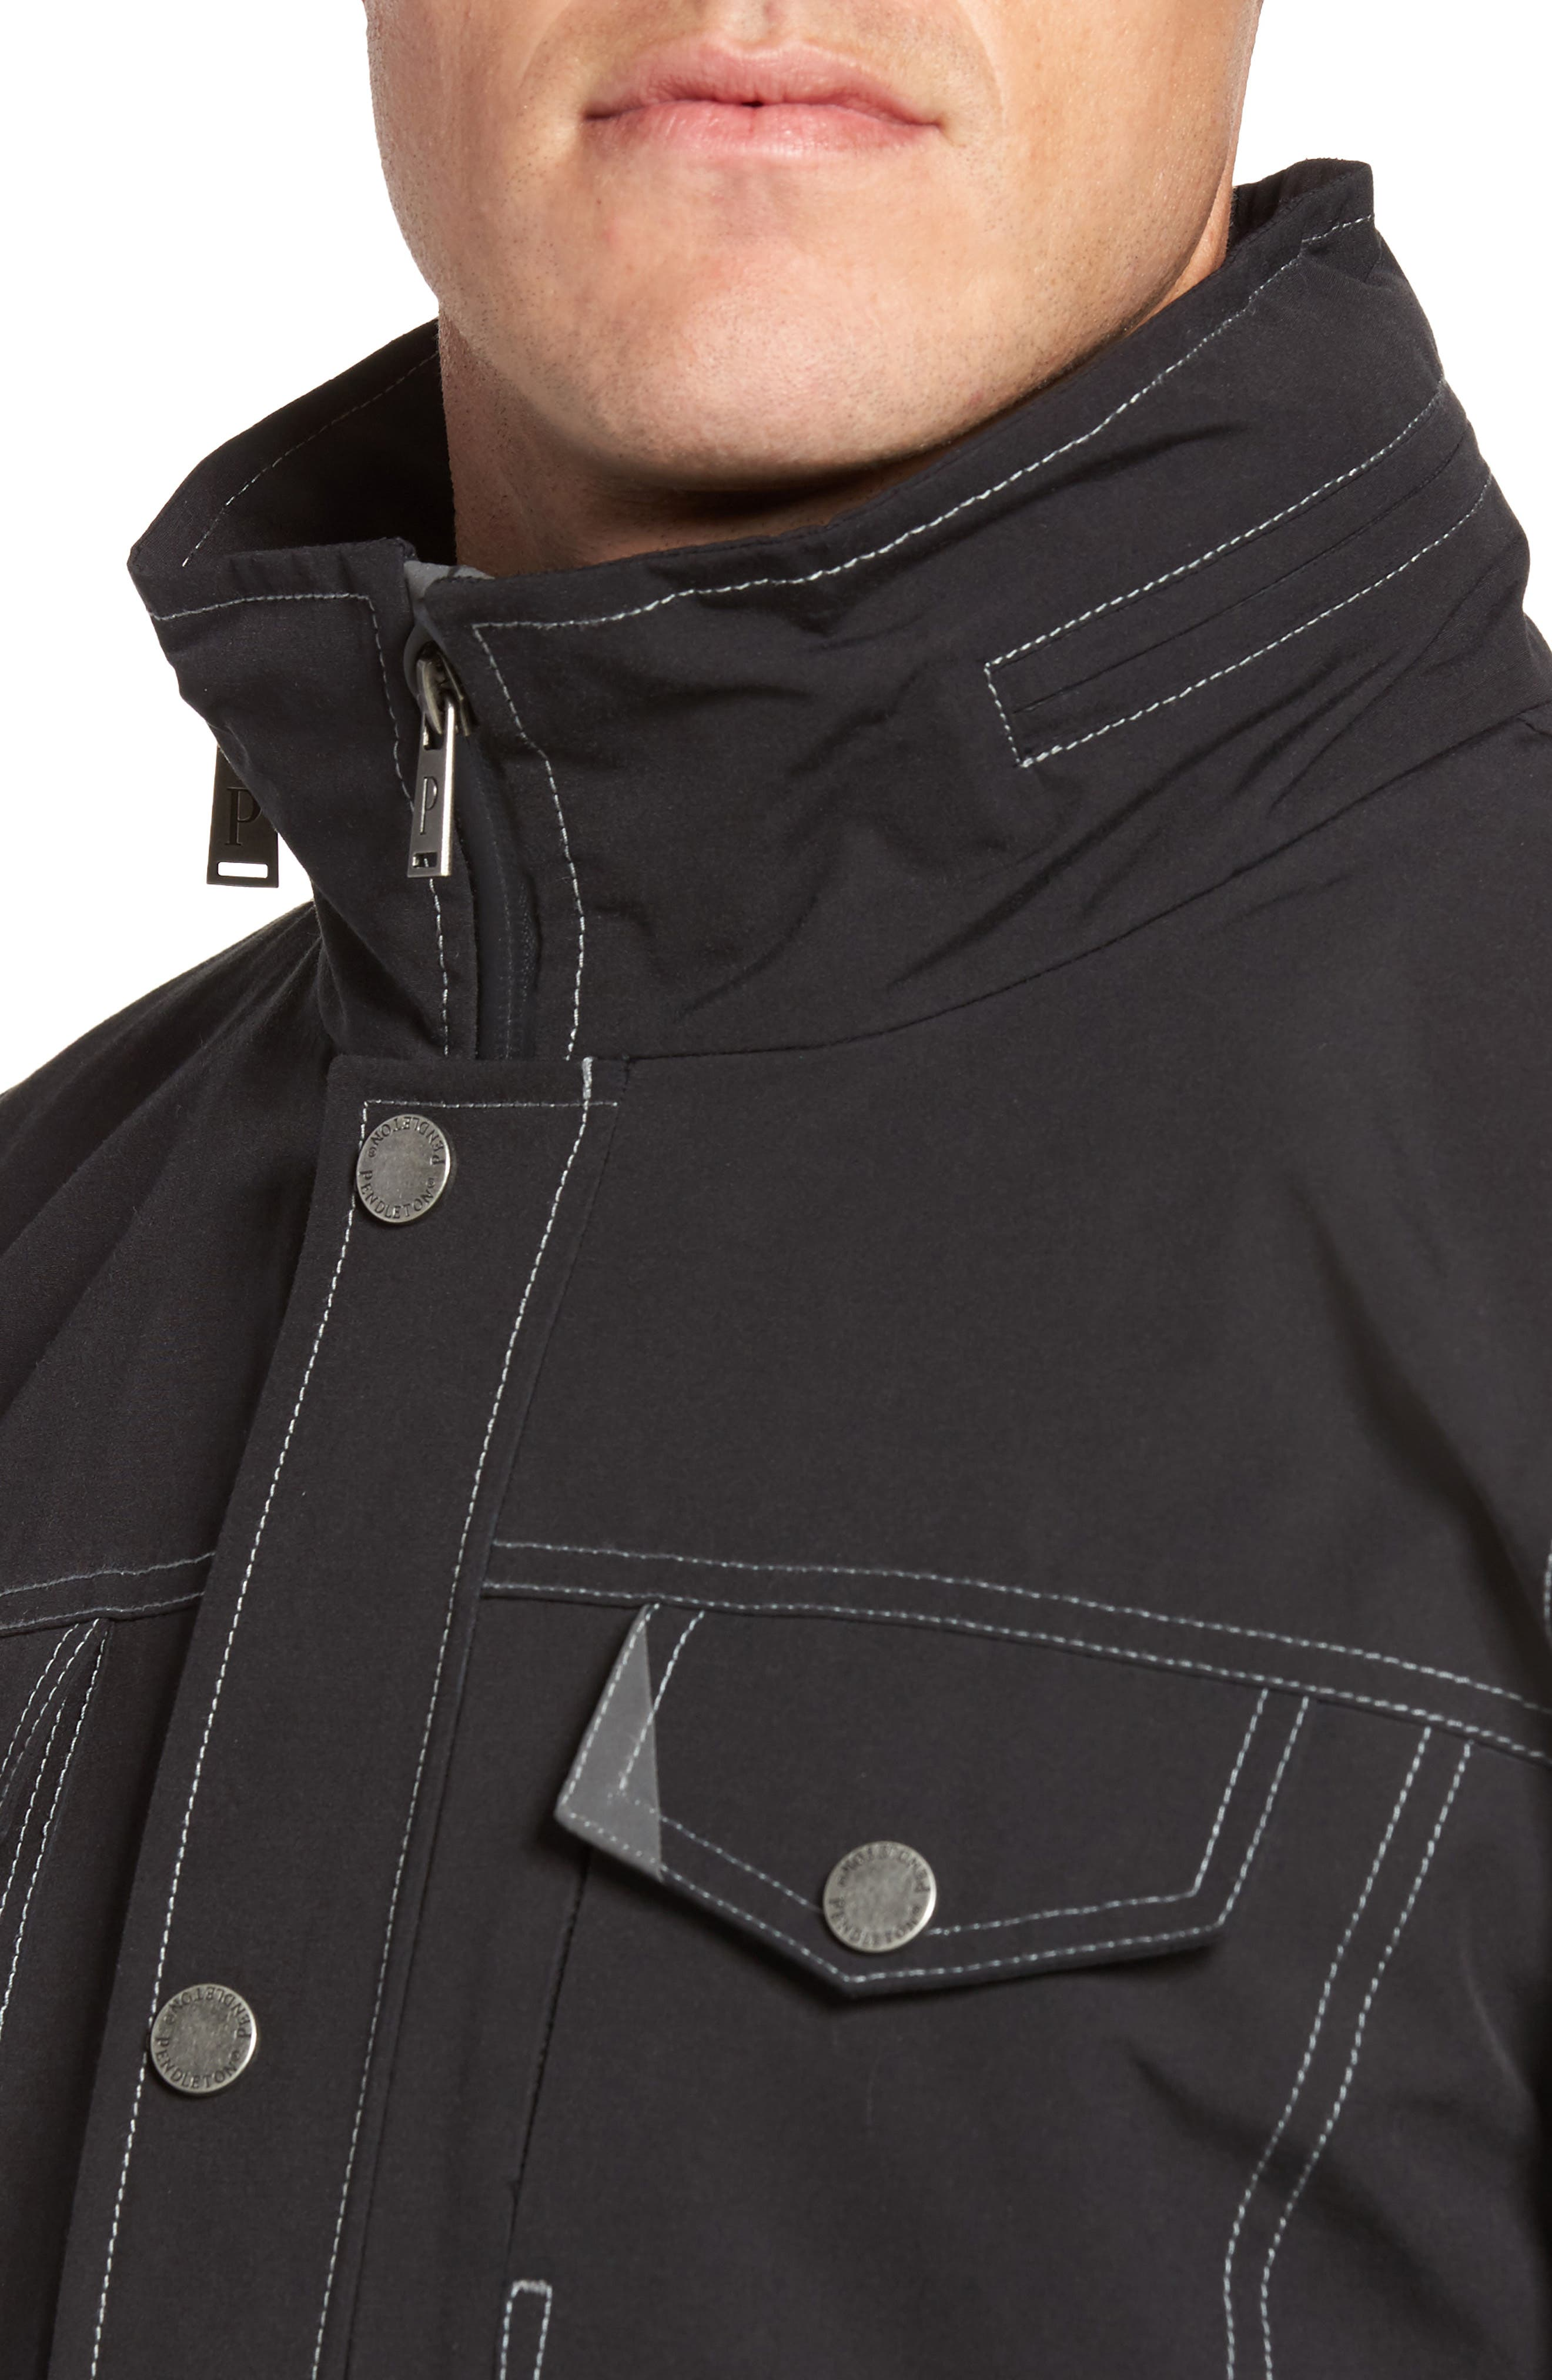 Forks Waterproof Jacket,                             Alternate thumbnail 4, color,                             001